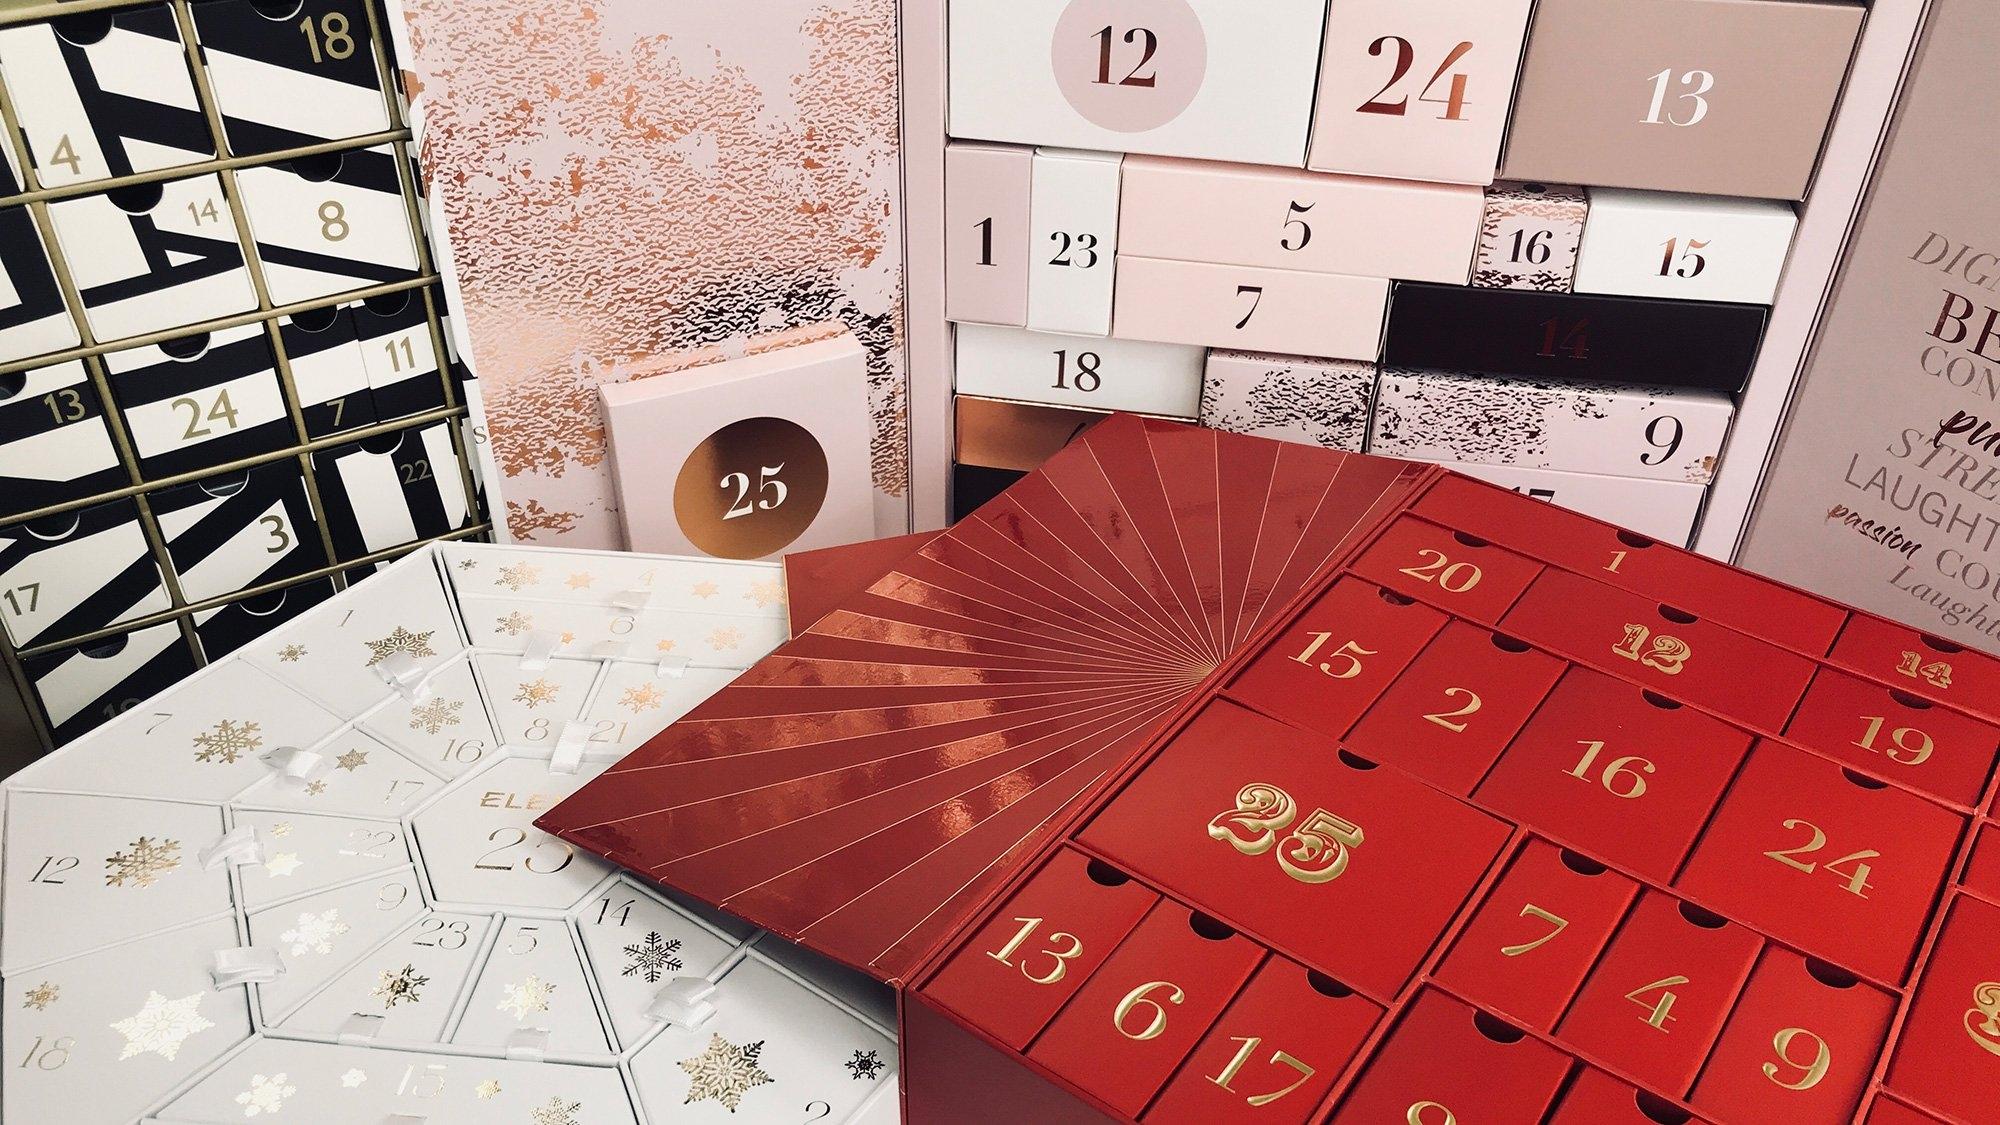 Beauty Advent Calendars On Sale: Bag A Bargain Before 2019 M&s Beauty Advent Calendar 2019